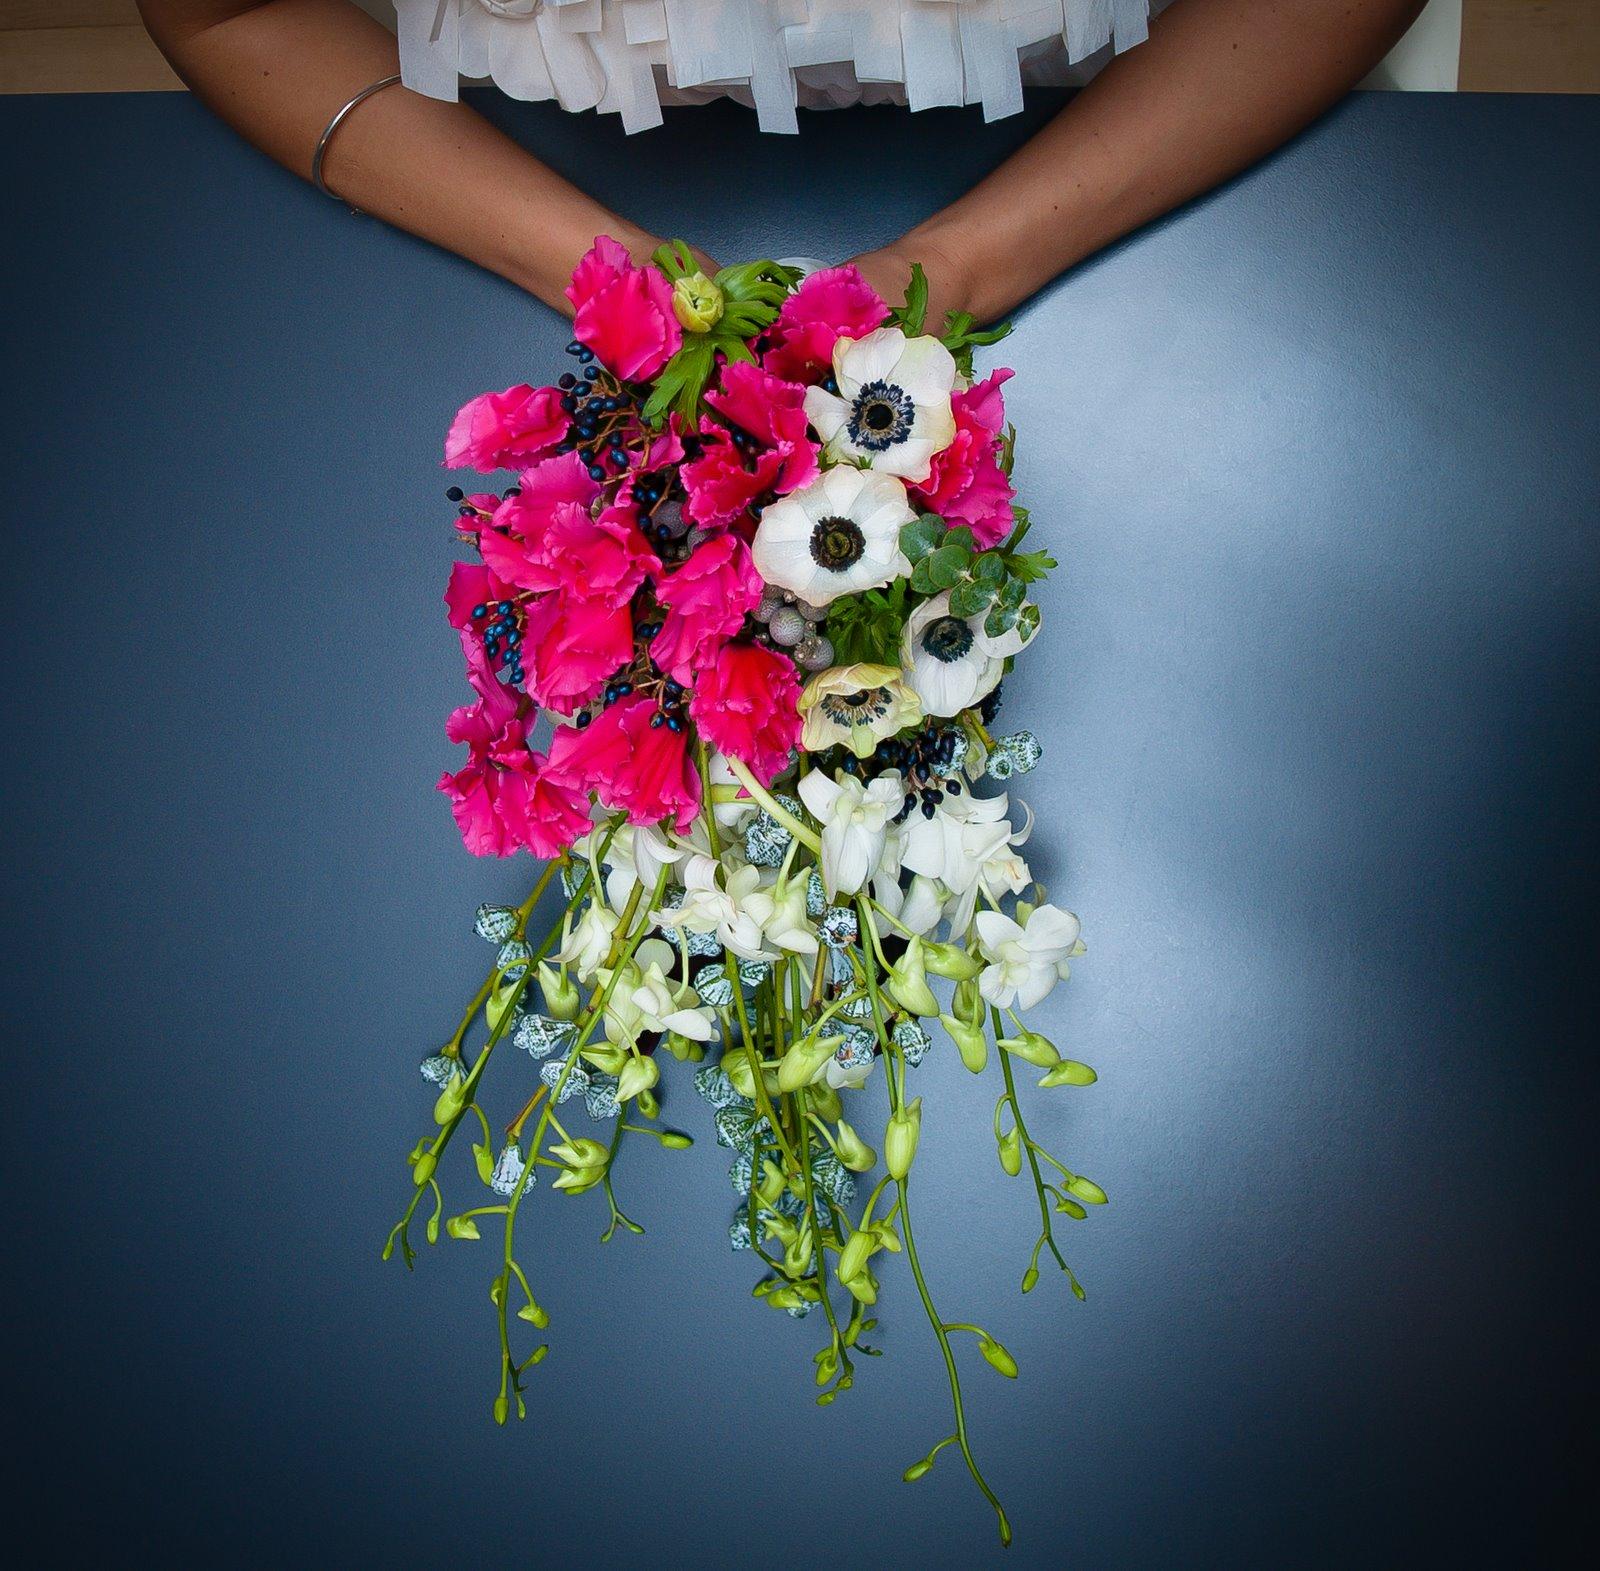 Wedding Flowers Lancashire: The Flower Magician: Sensational Raspberry And Ivory